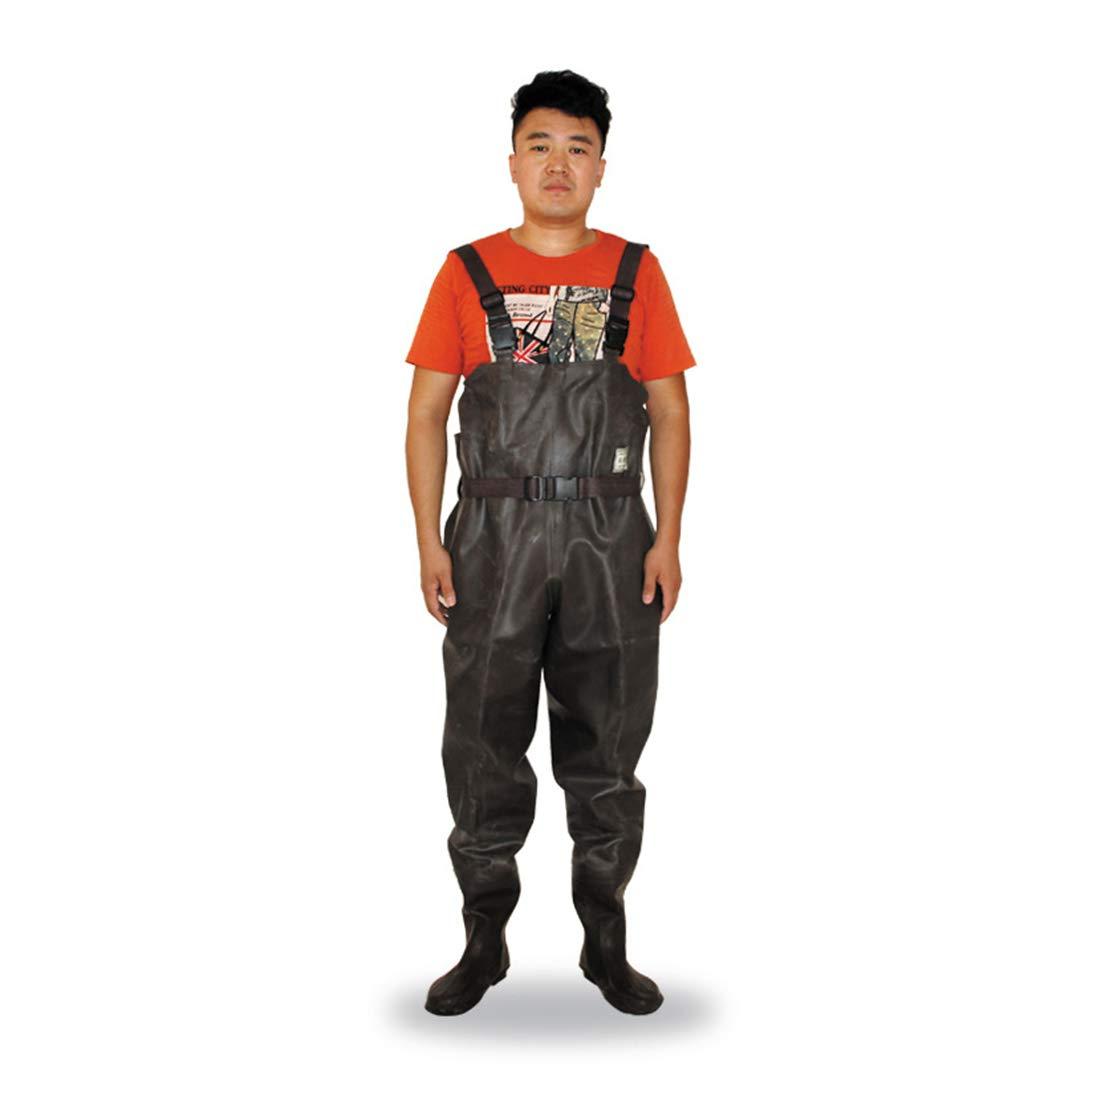 LBWNB Wader Pants-100% Wasserdichte PVC-Brustwarzen Fly Coarse Fishing Breathable Hunting Cultivation Stiefelfuß mit Gürtel B07Q9LTGT2 Regenhosen Auktion